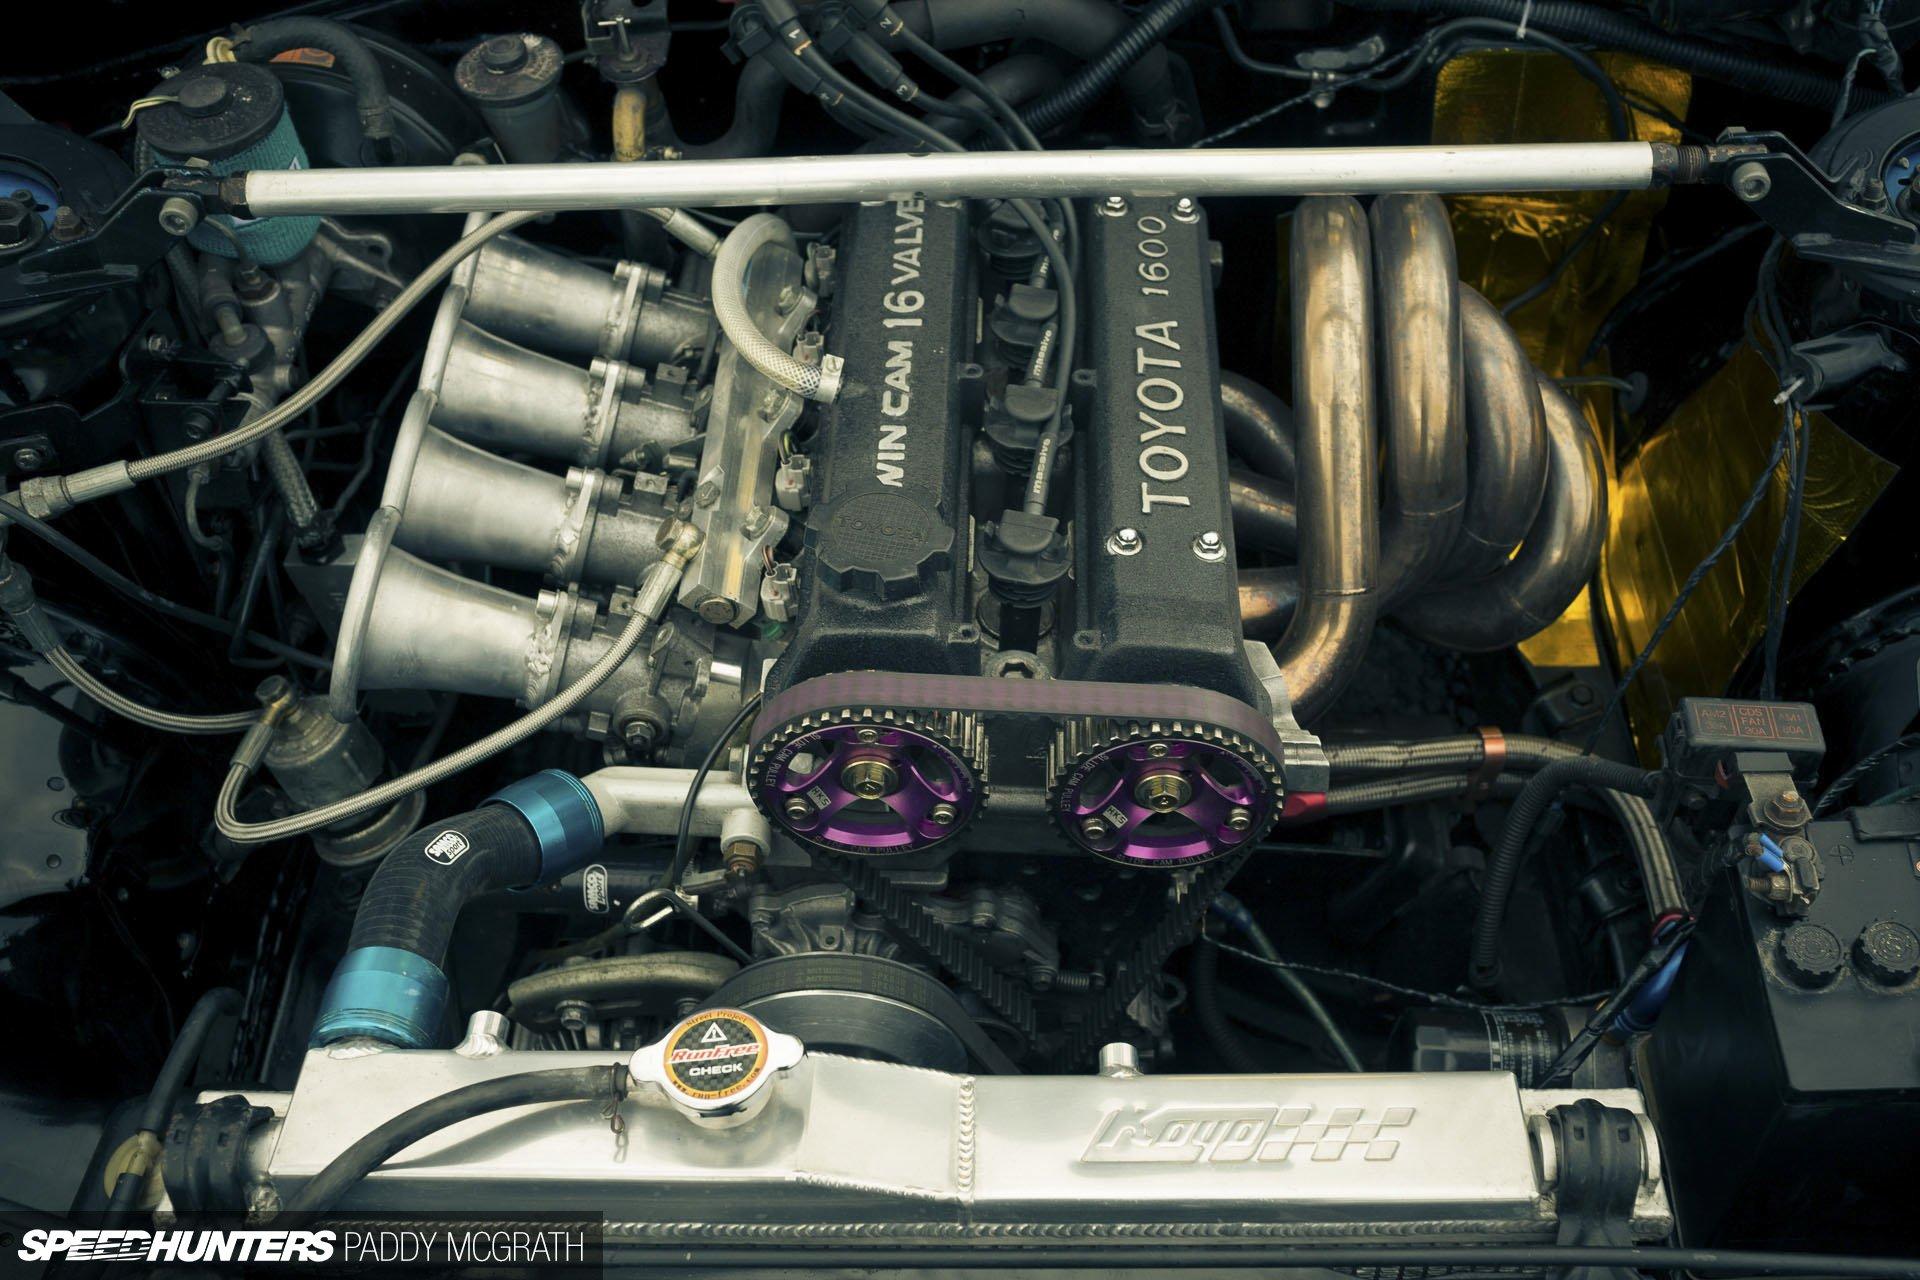 Toyota Furio engineTeam-Disco-AE86-PMcG-19N wallpaper | 1920x1280 | 324721 | WallpaperUP